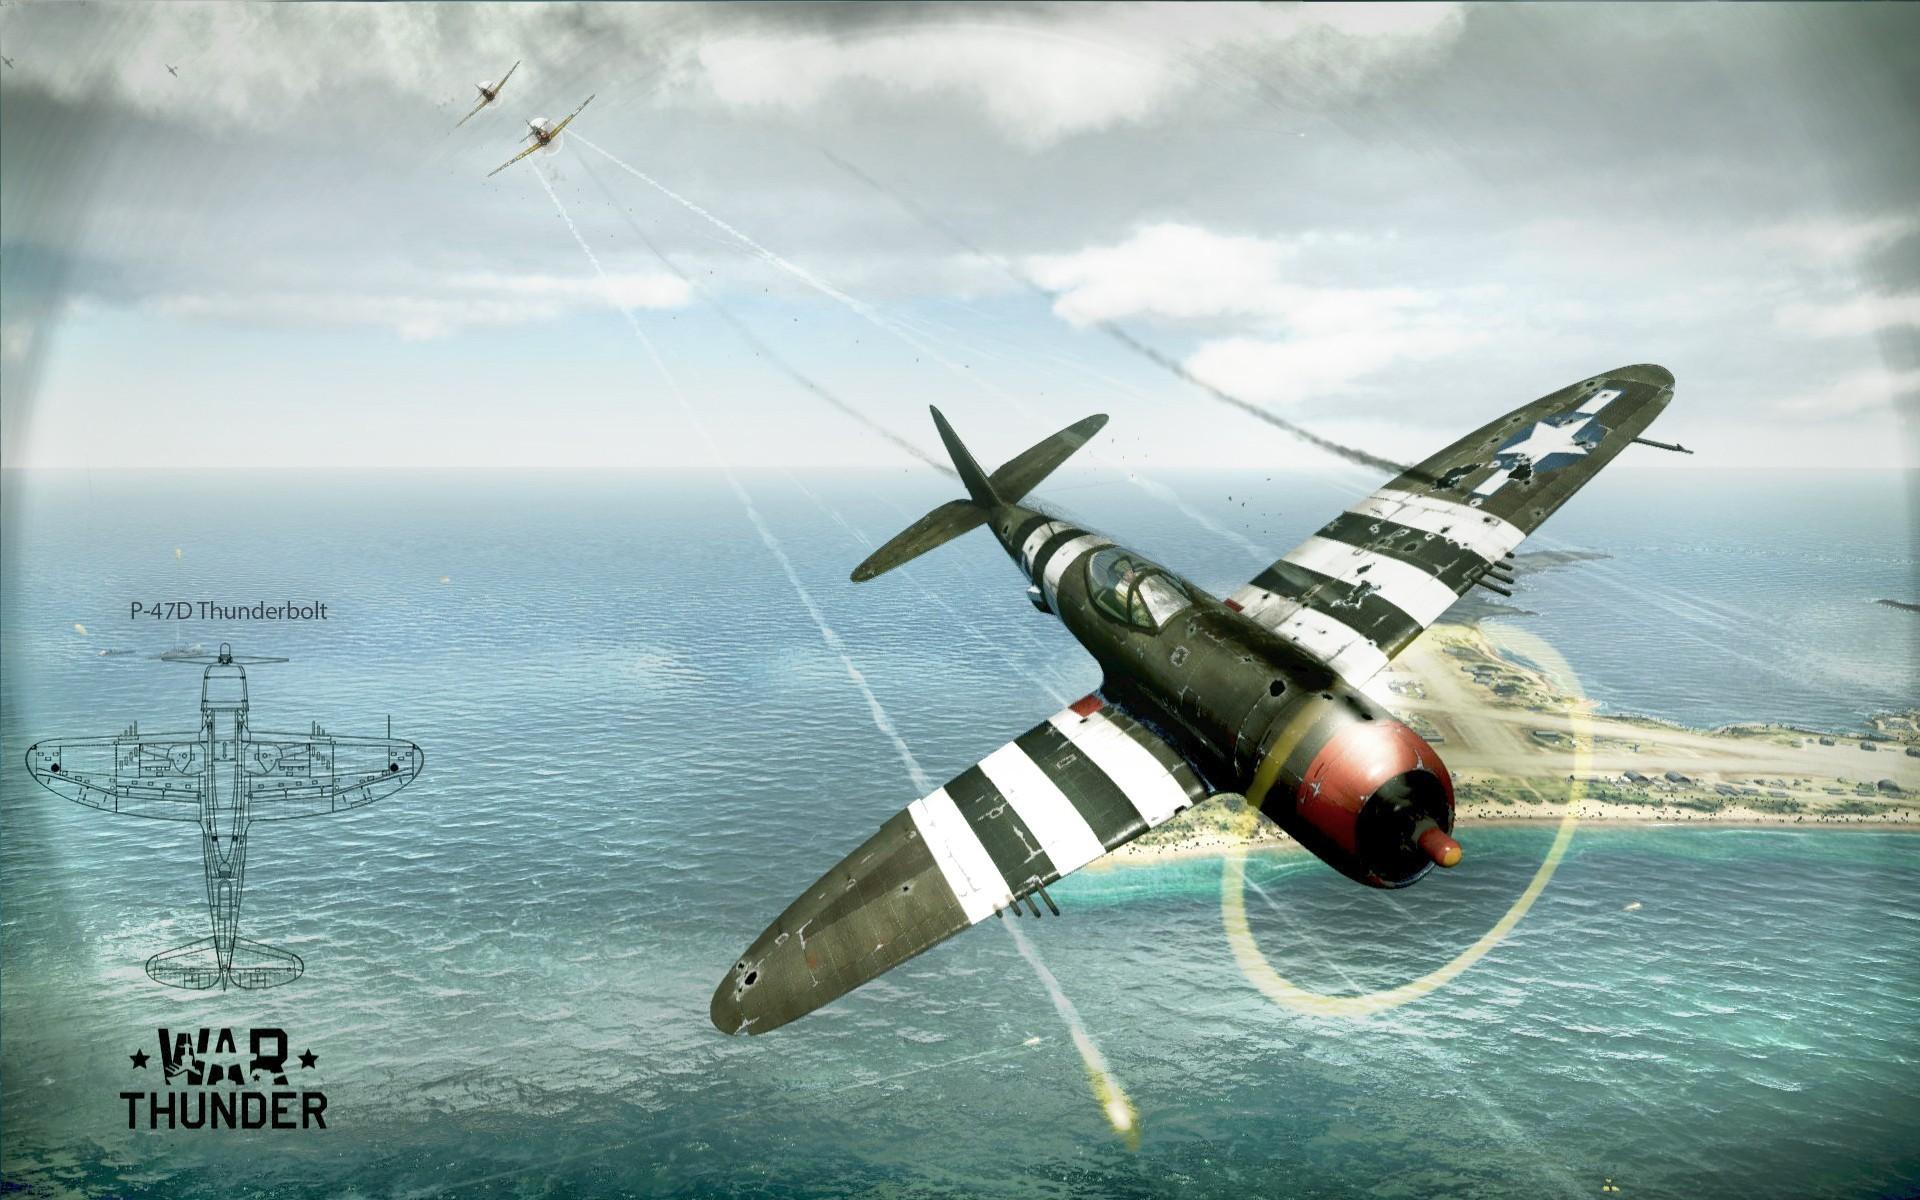 General 1920x1200 aircraft airplane P-47 Thunderbolt war World War II War Thunder PC gaming vehicle